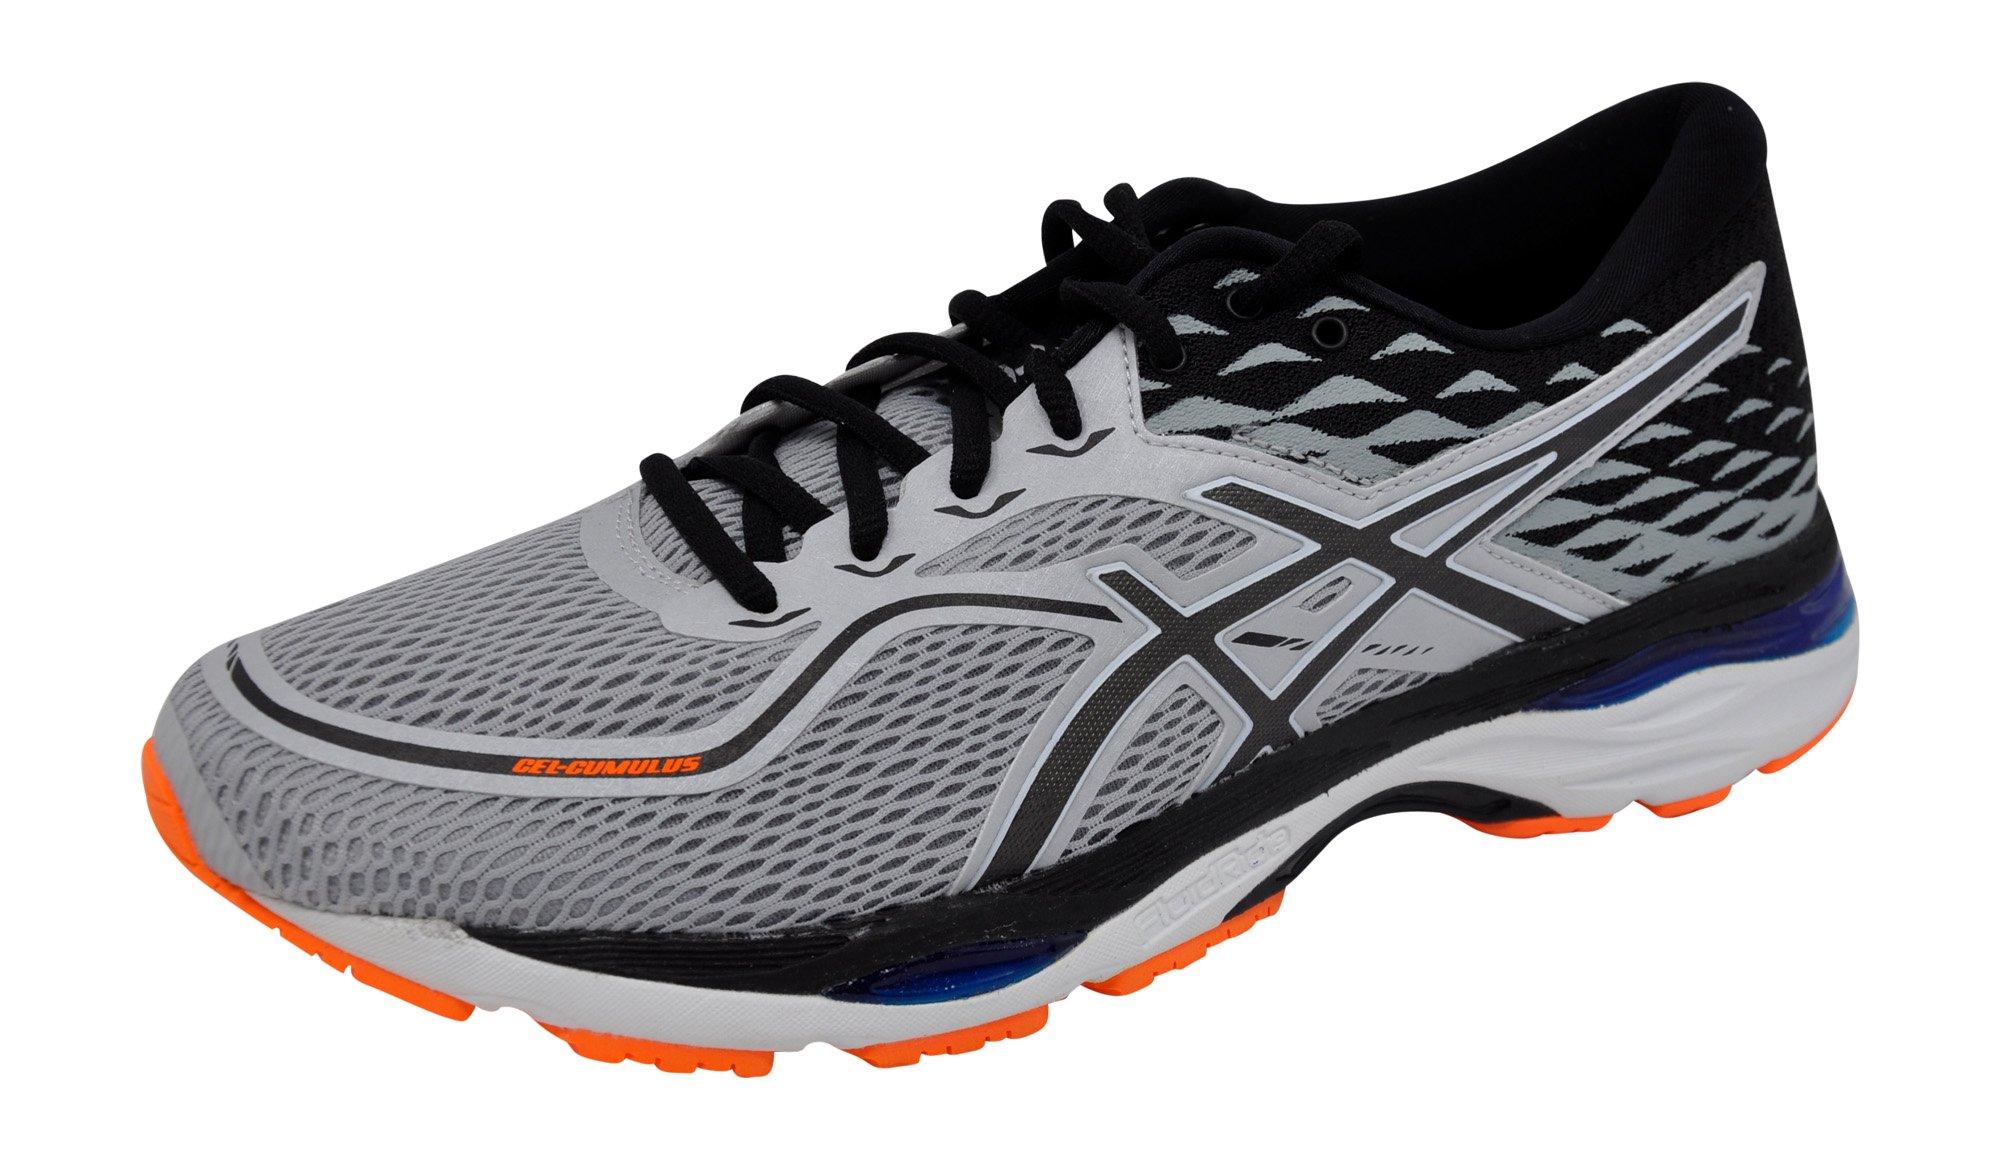 buy online 36dd3 3eb59 Galleon - ASICS Mens Gel-Cumulus 19 Running Shoe, Grey White, 11.5 M US